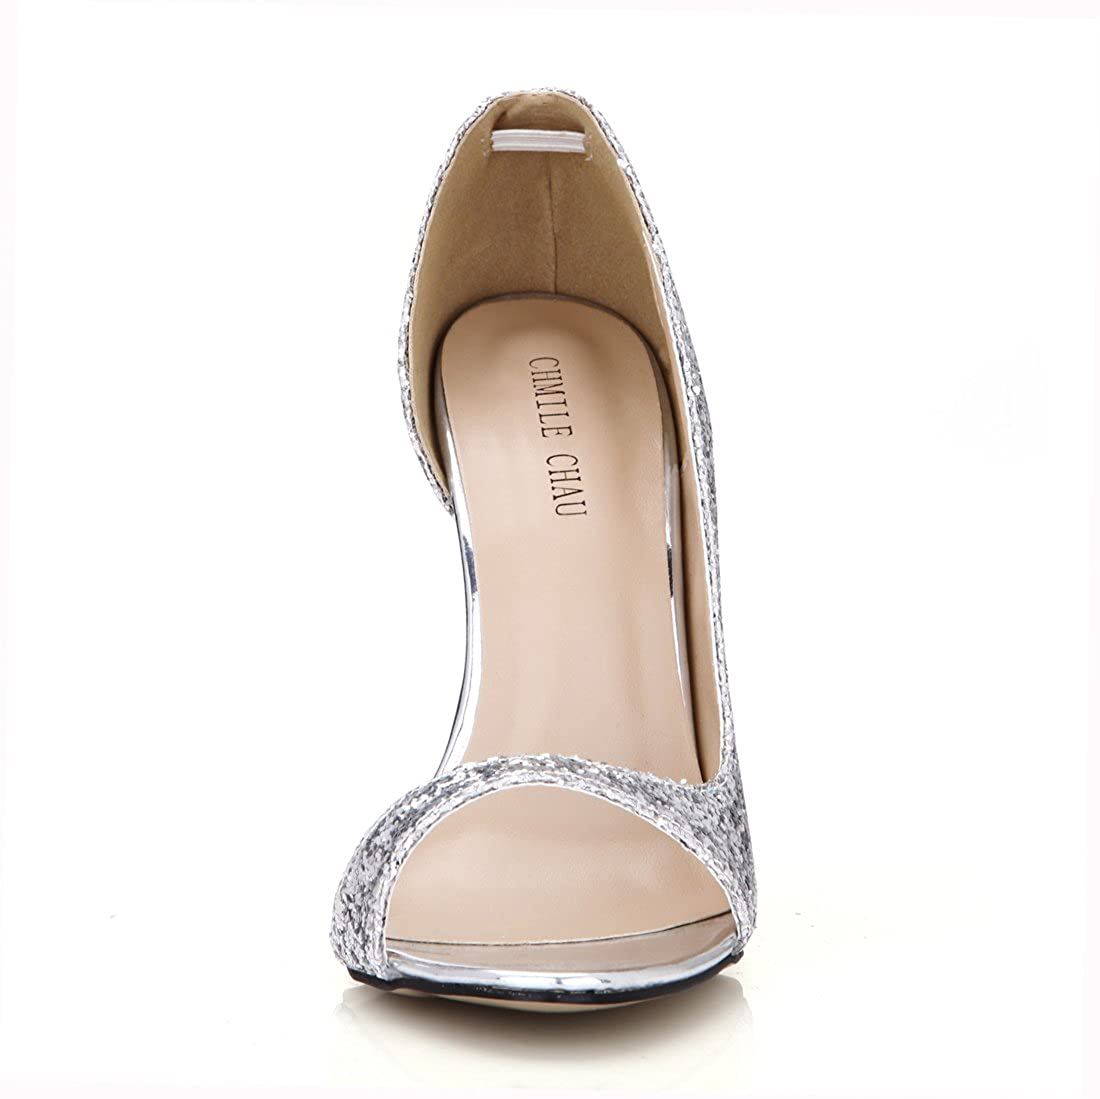 58ad1e56f67f Amazon.com | CHMILE CHAU Women Dress Pumps Sexy Stiletto High Heels Peep Toe  Size Open Ladies Shoes | Pumps